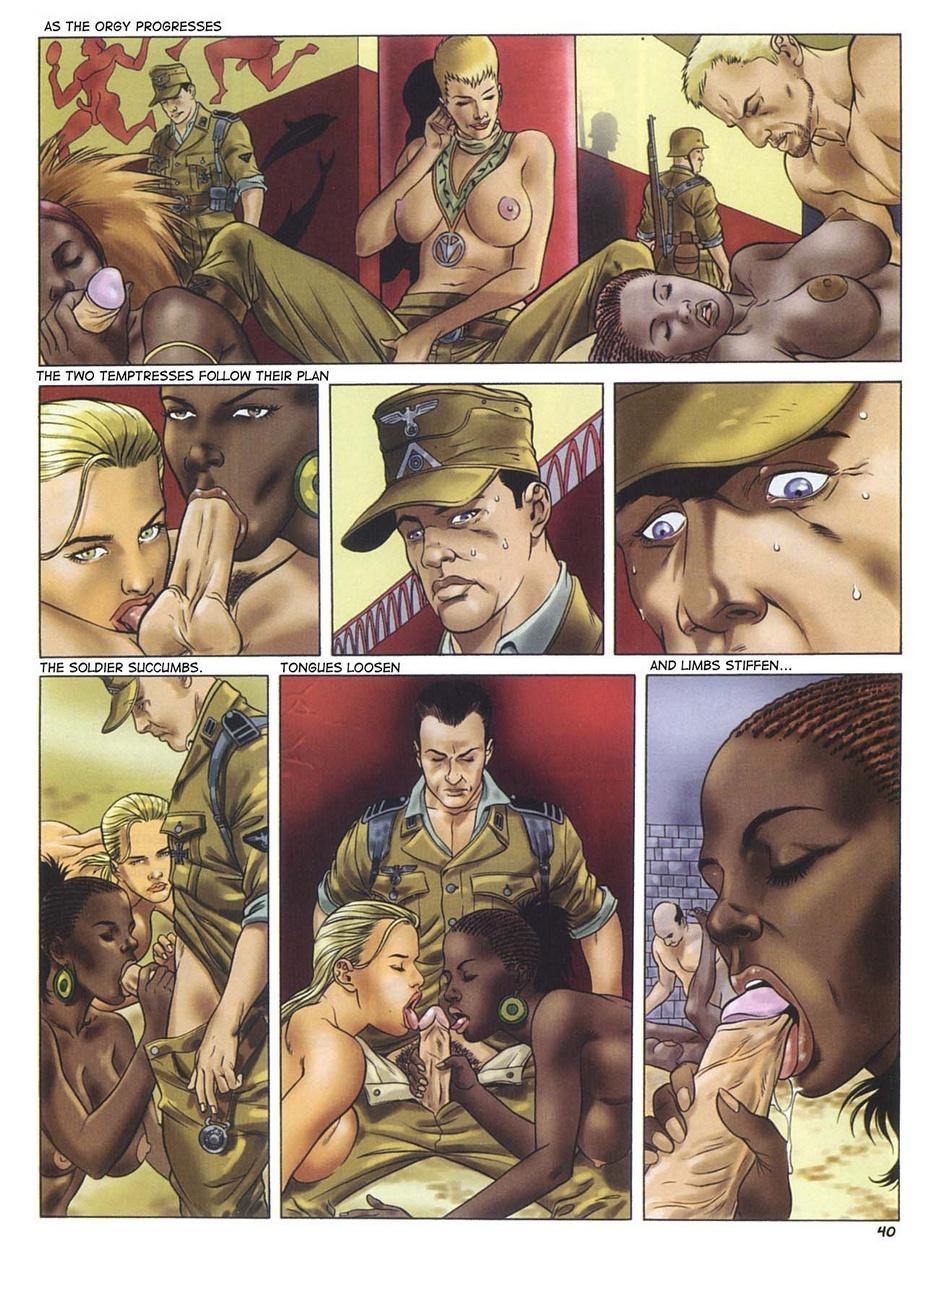 Lara Jones 1 - The Amazons - part 3